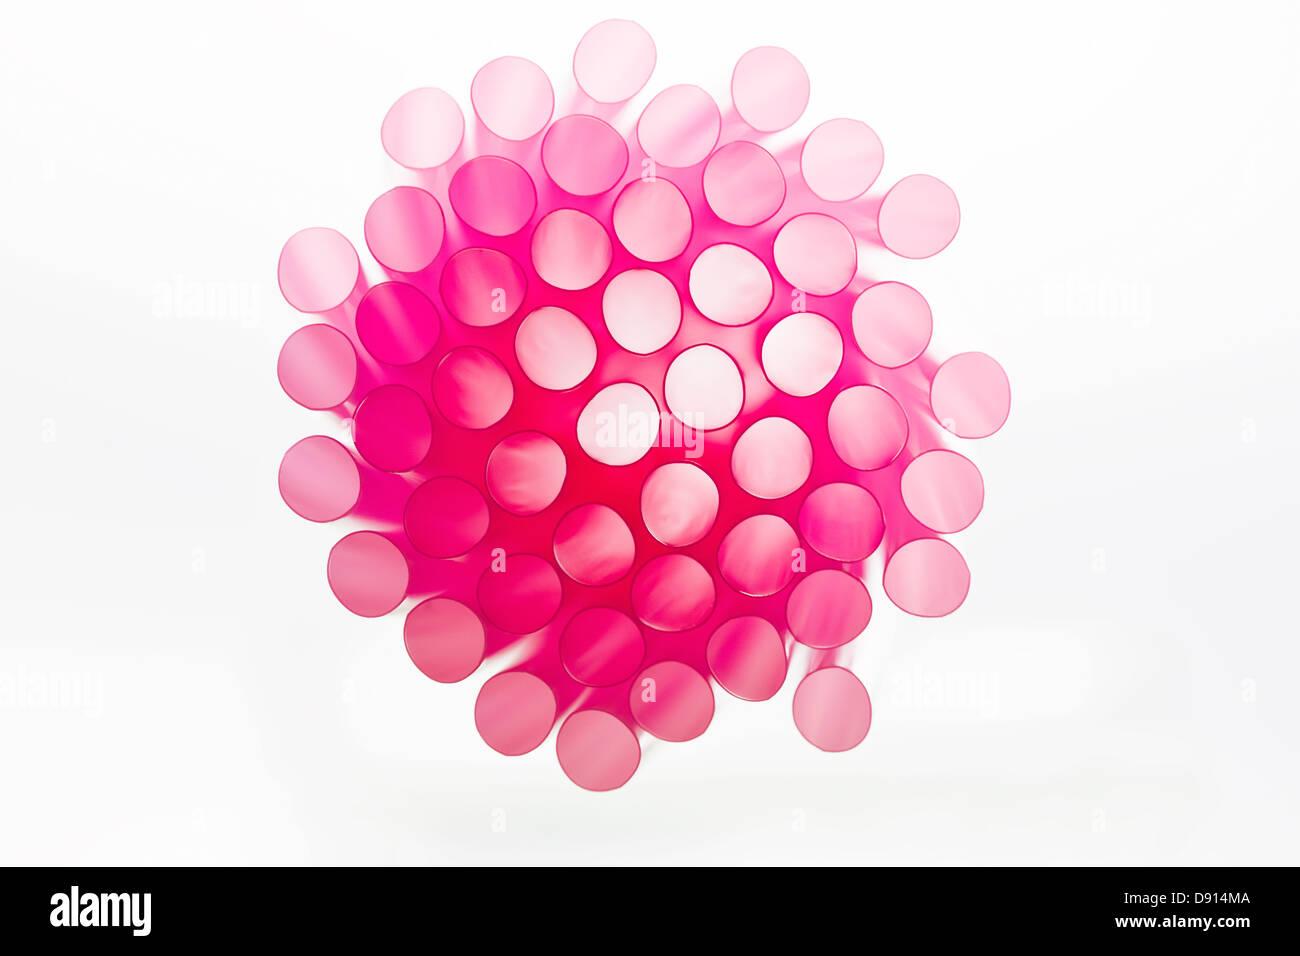 Foto de estudio de rosa pajas Imagen De Stock